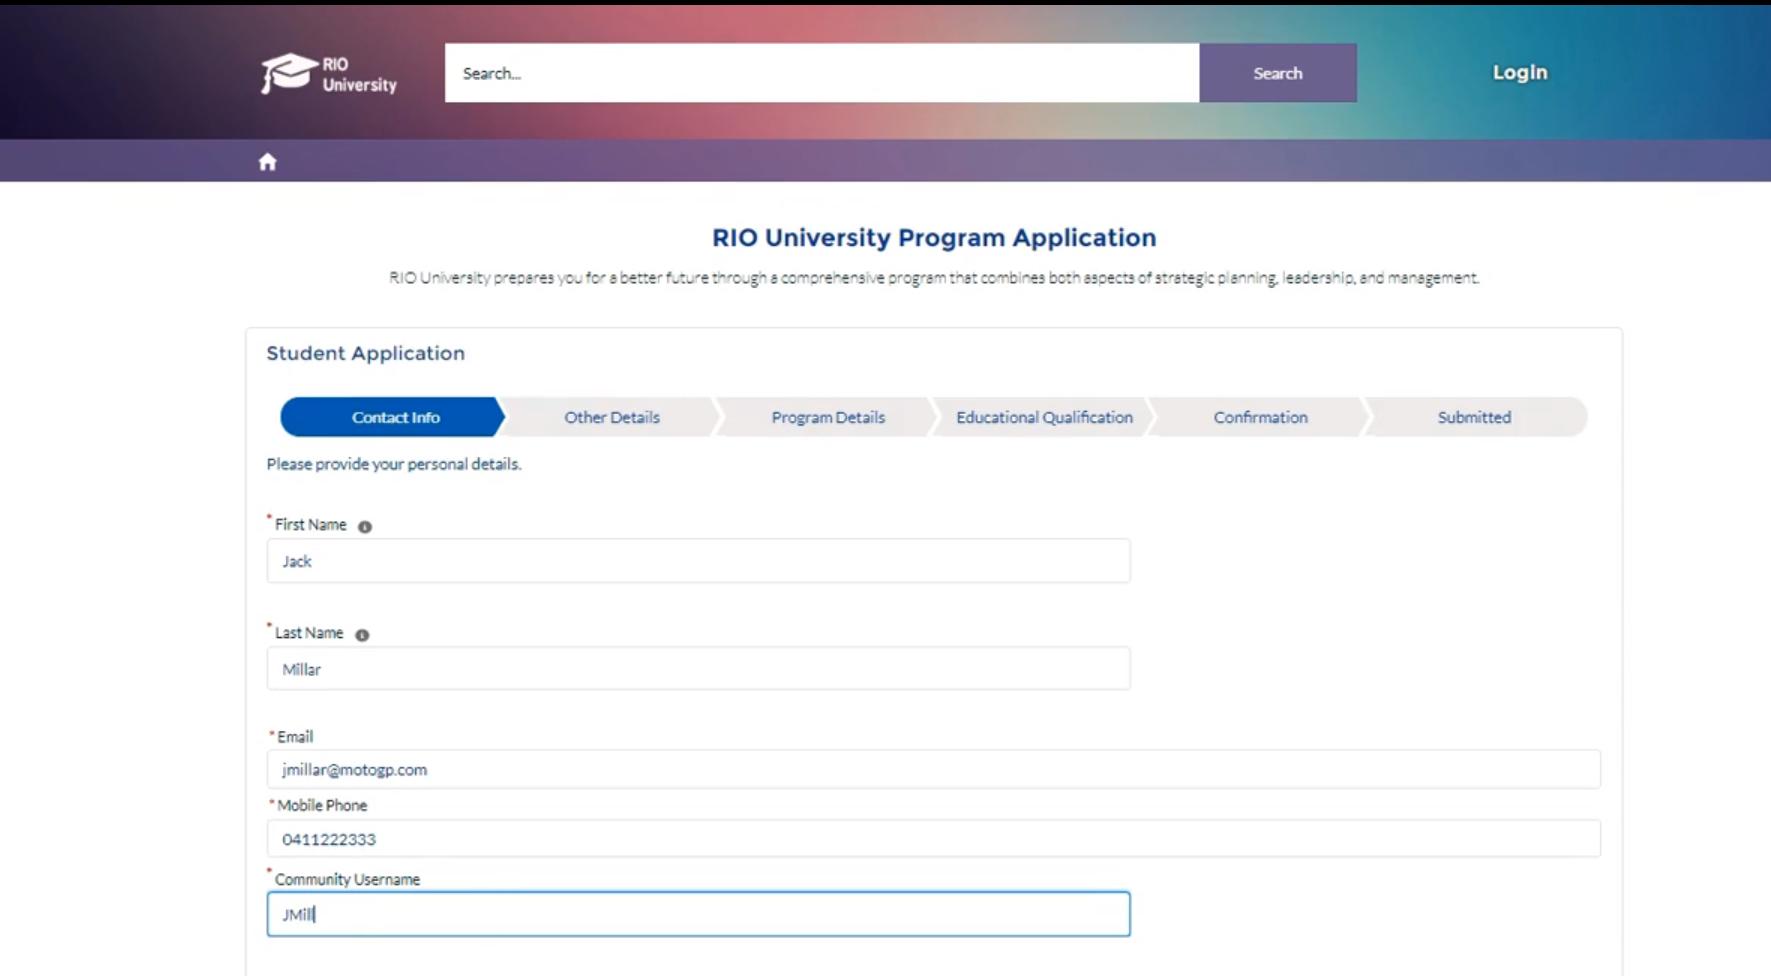 RIO Education program application